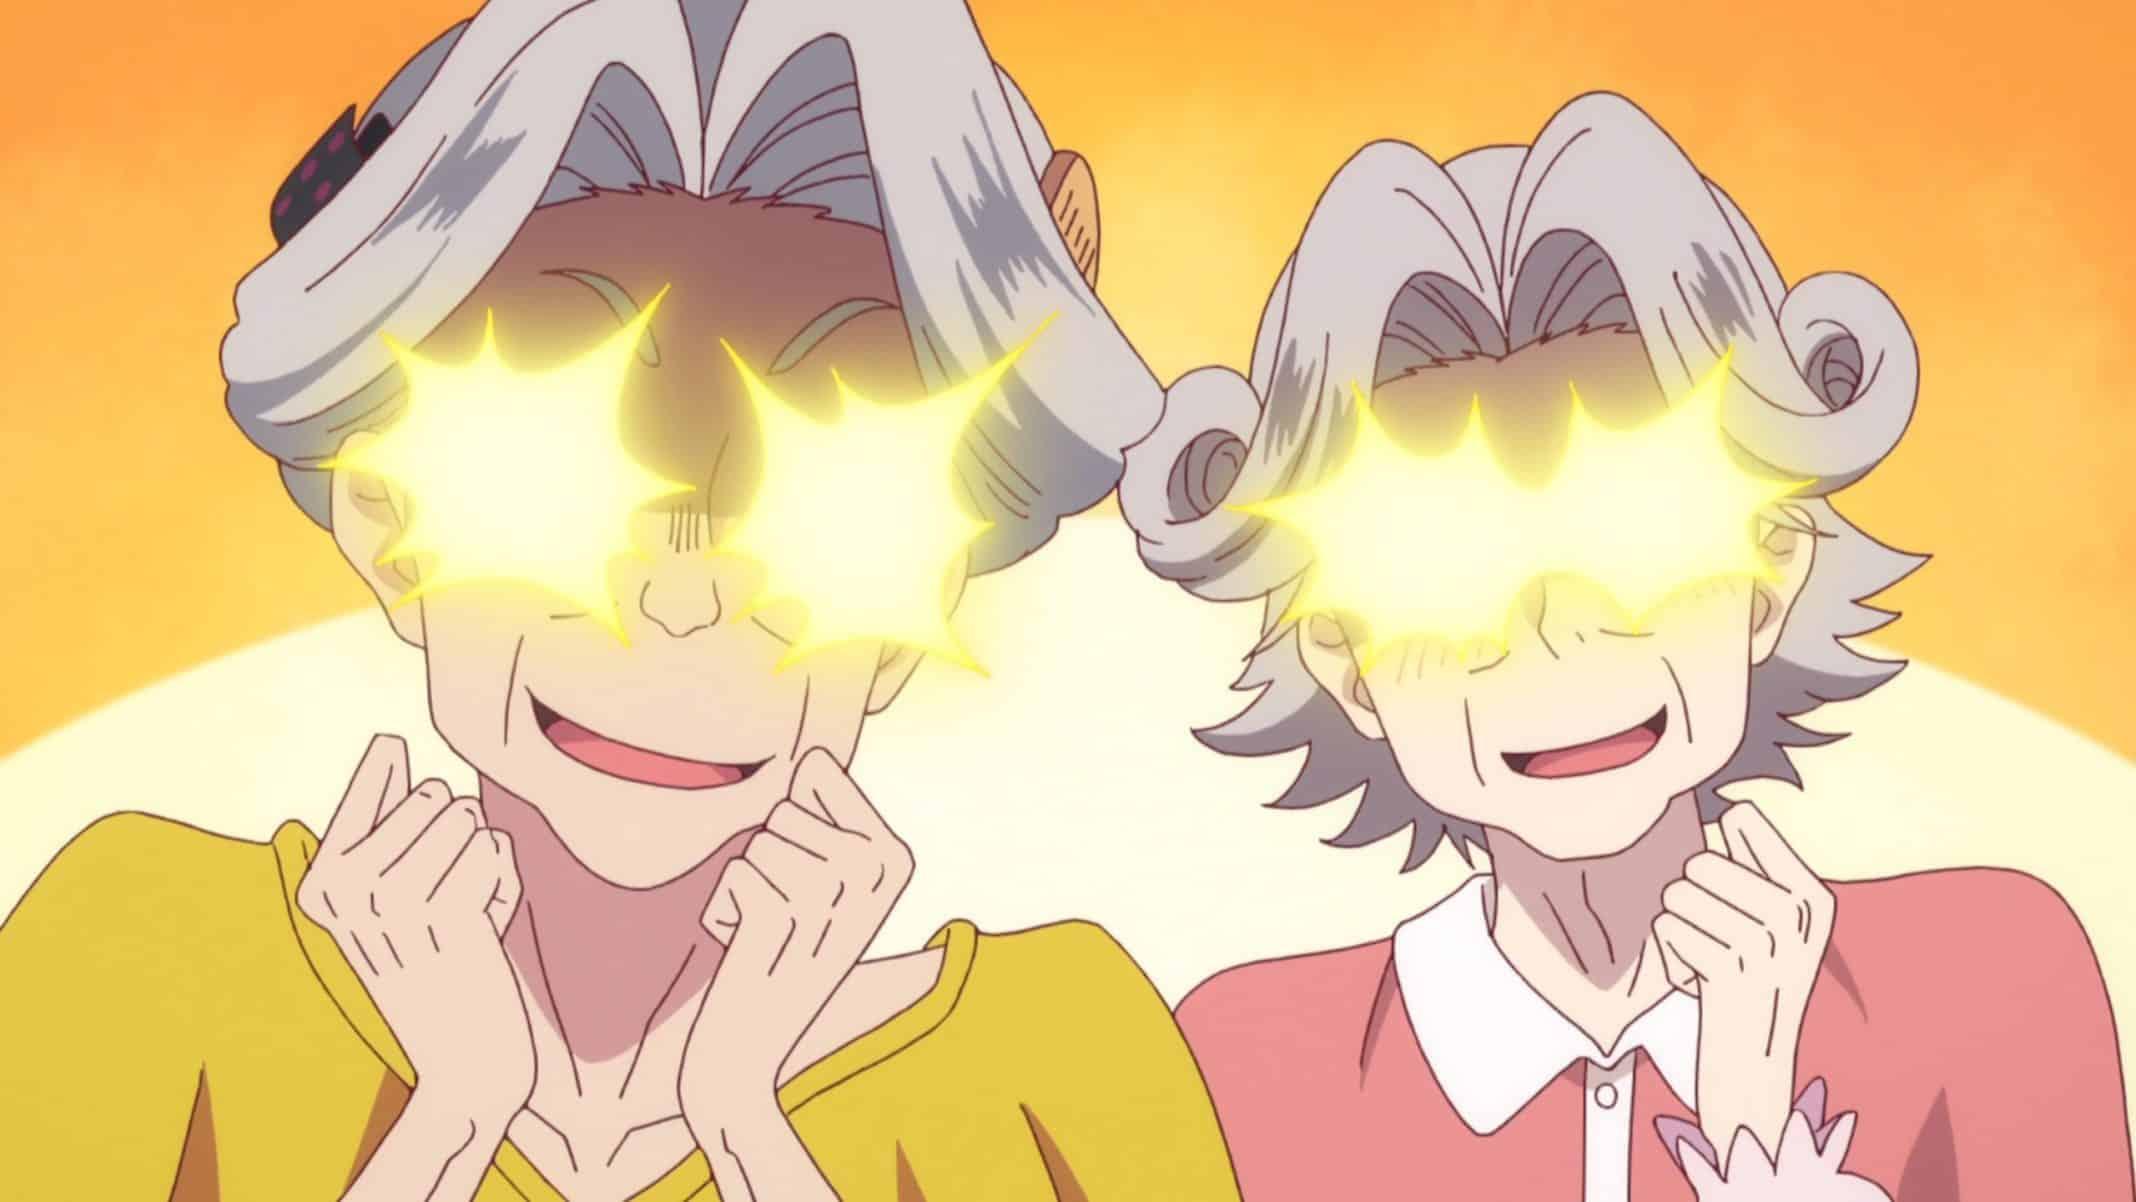 Nagomin and Sayutaso (Sadaoka Sayuri) reveling in their ill intentions.